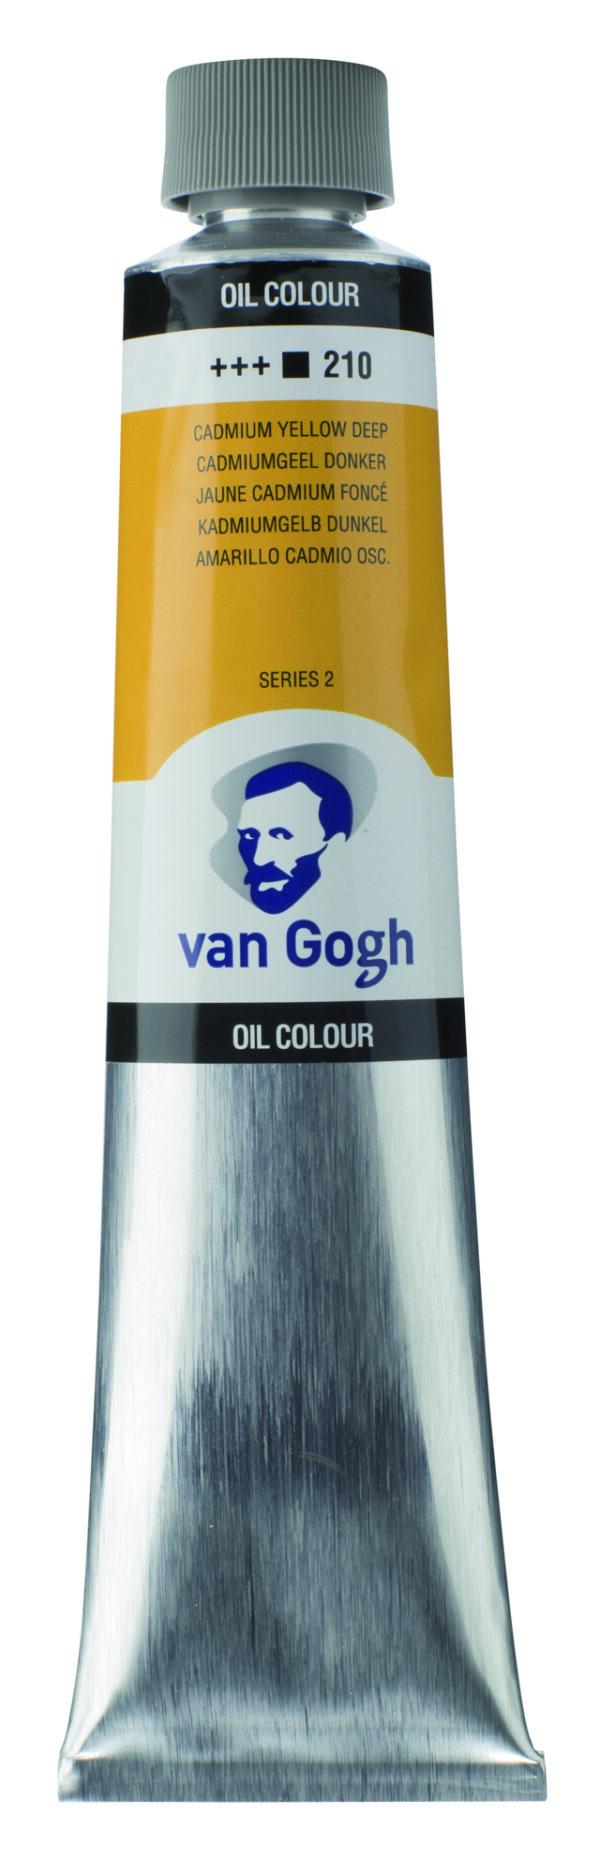 Van Gogh 210 Cadmium yellow Deep - 200 ml